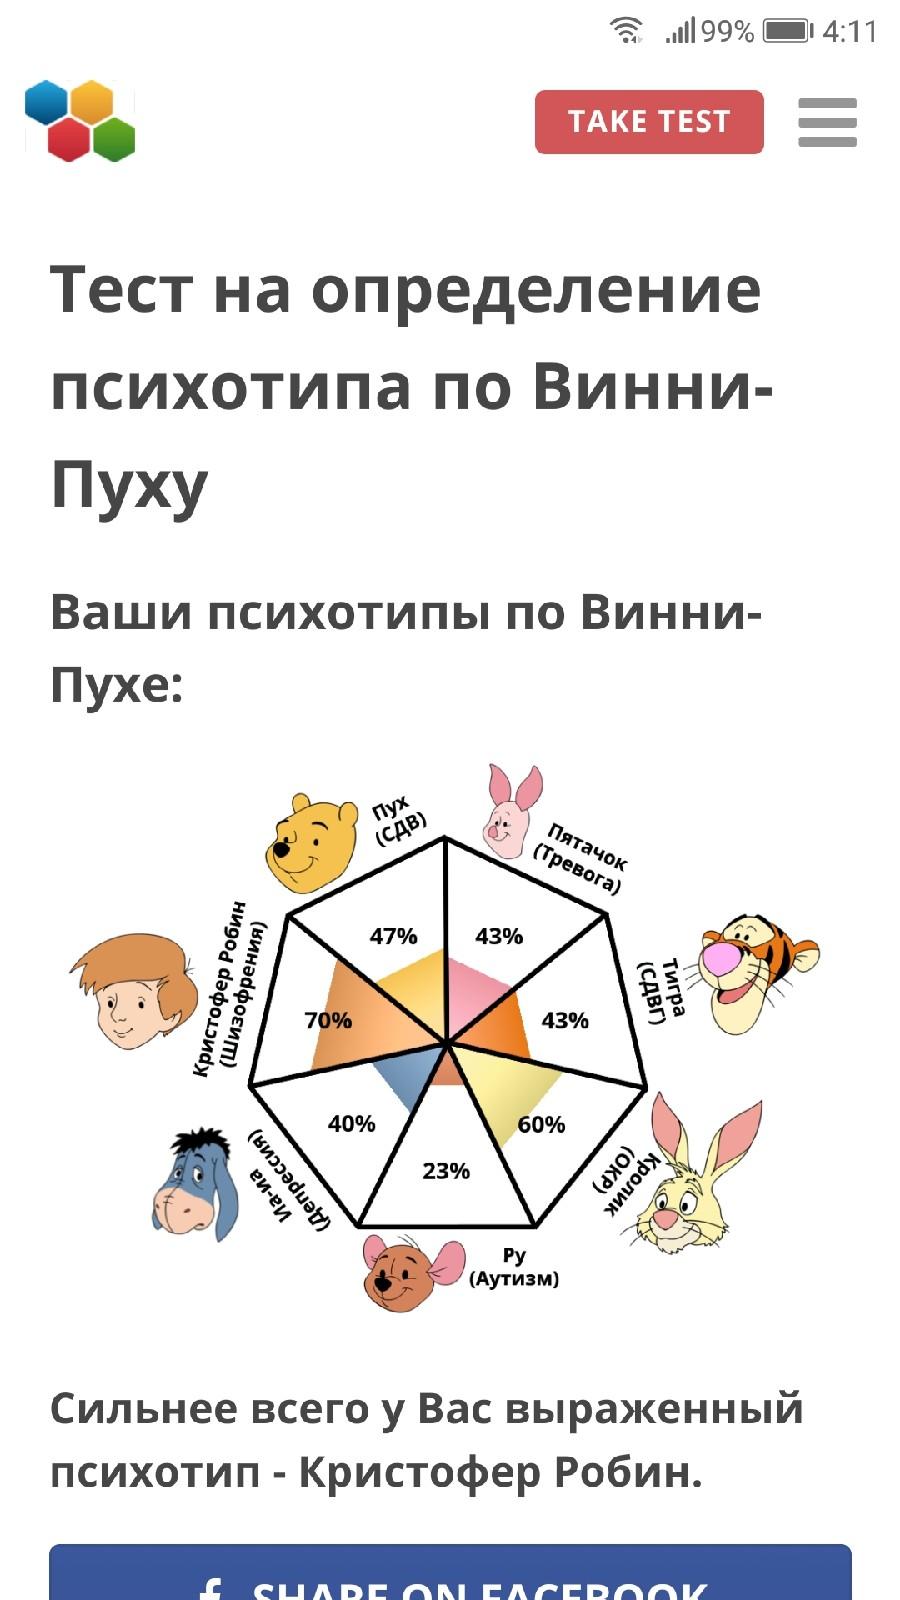 https://pp.userapi.com/c854532/v854532178/5ab6f/I4si3xb7ywo.jpg